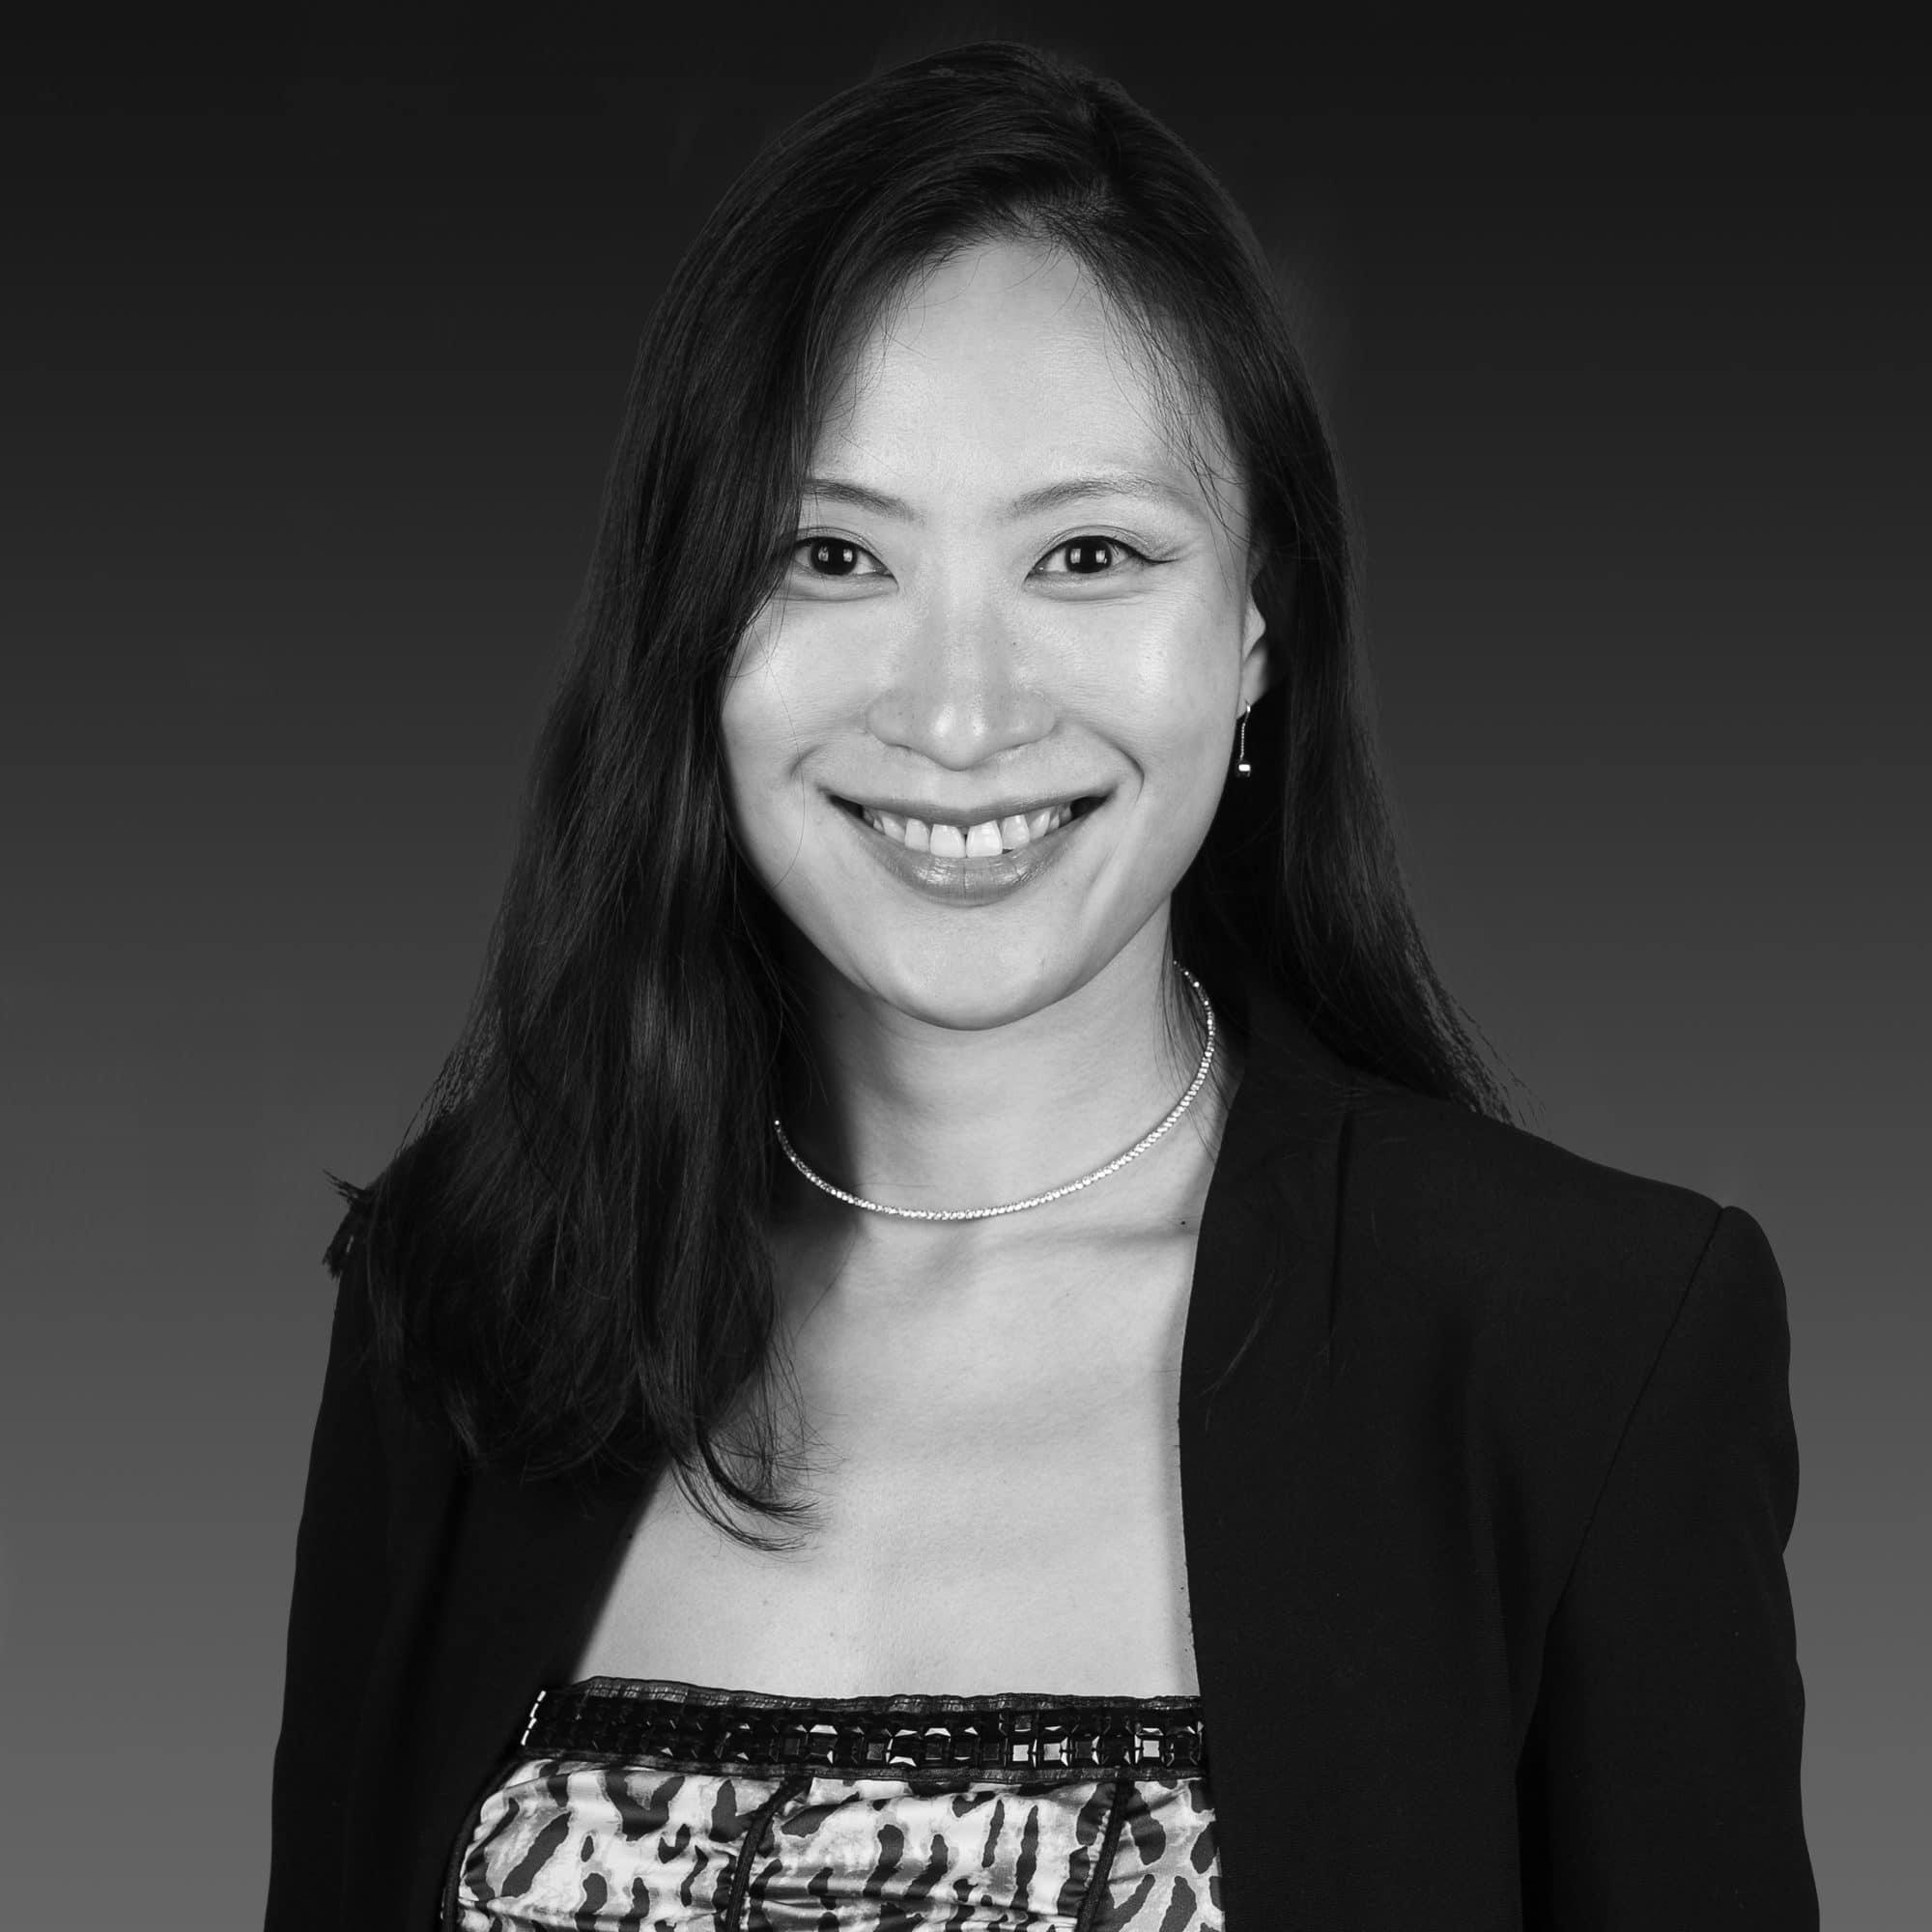 Angela Cai, Director of Marketing Communications